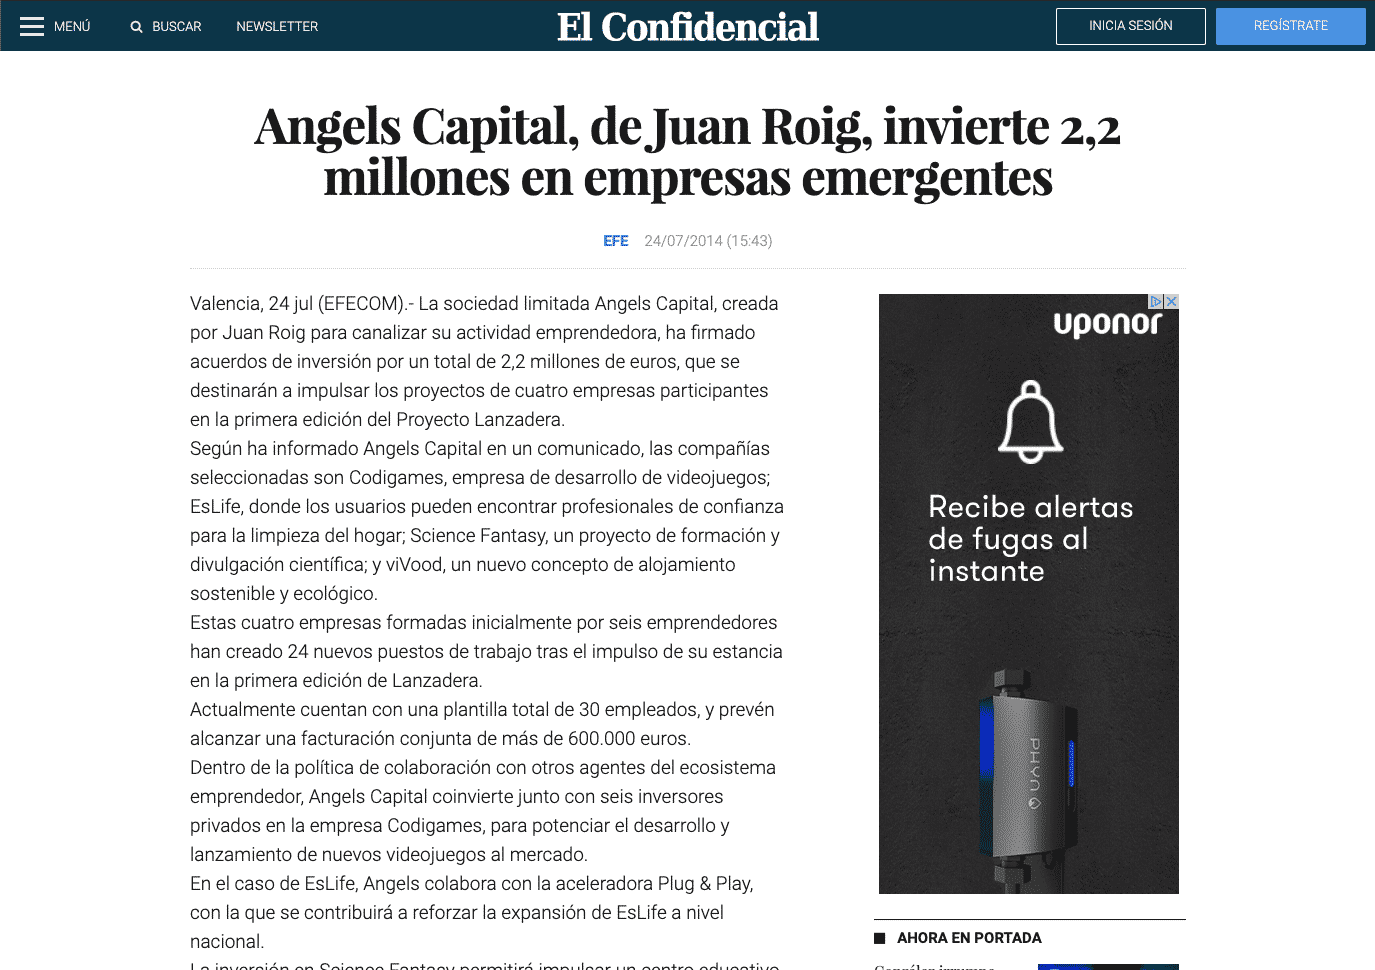 https://www.elconfidencial.com/ultima-hora-en-vivo/2014-07-24/angels-capital-de-juan-roig-invierte-2-2-millones-en-empresas-emergentes_322760/